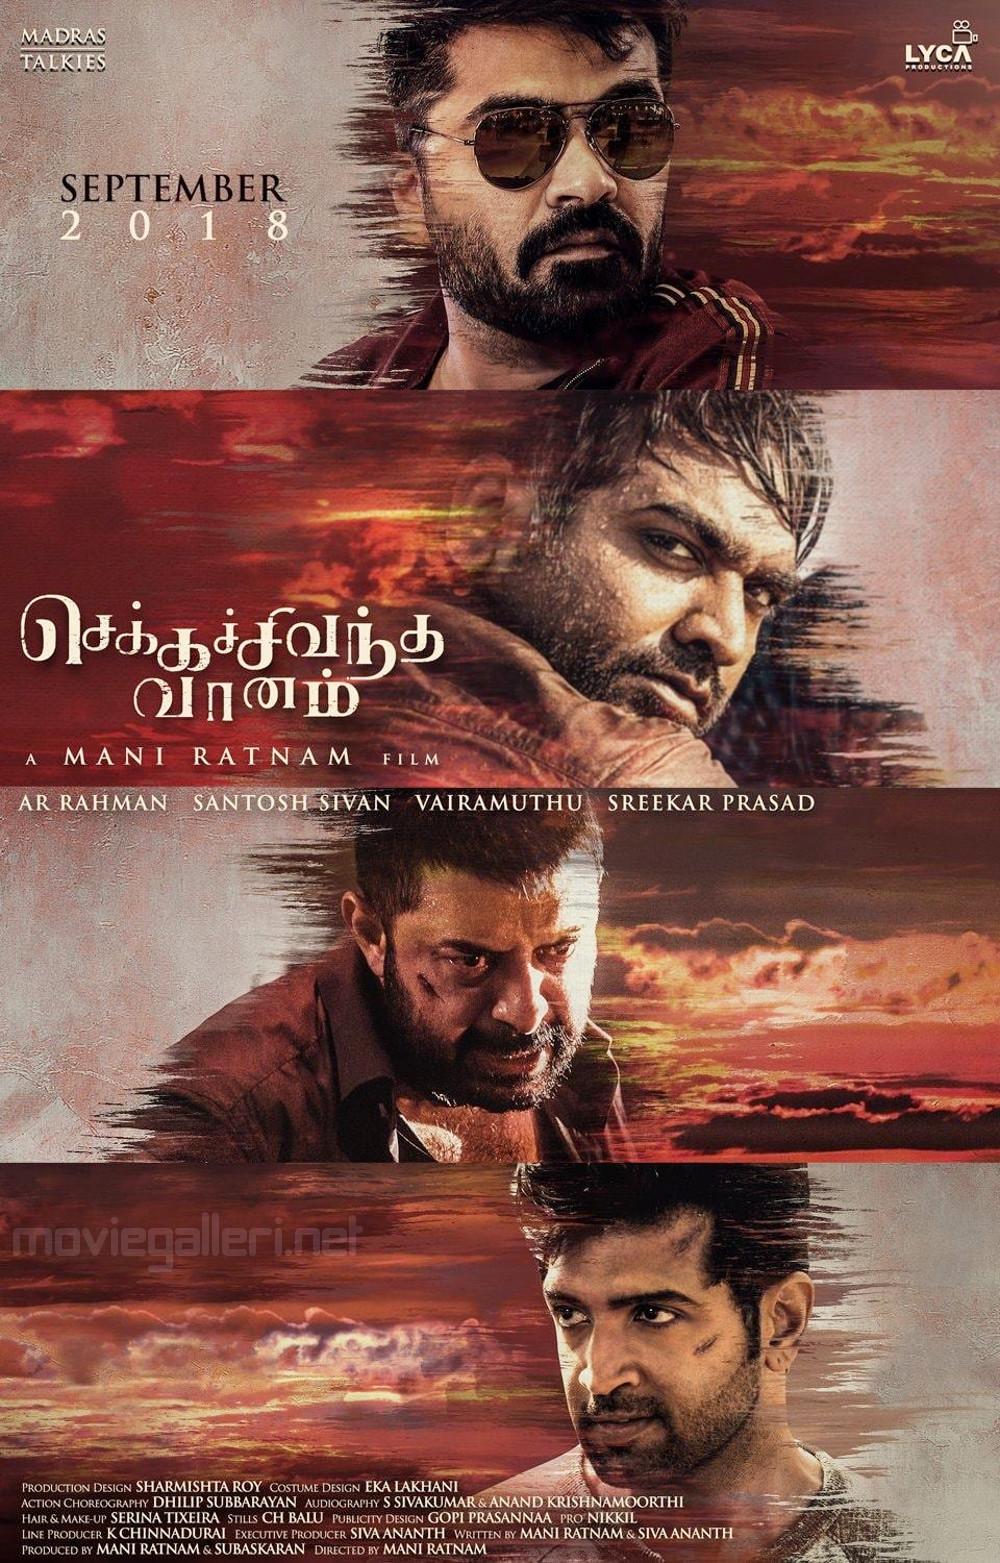 Simbu Vijay Sethupathi Arvind Swami Arun Vijay Chekka Chivantha Vaanam Movie Poster HD